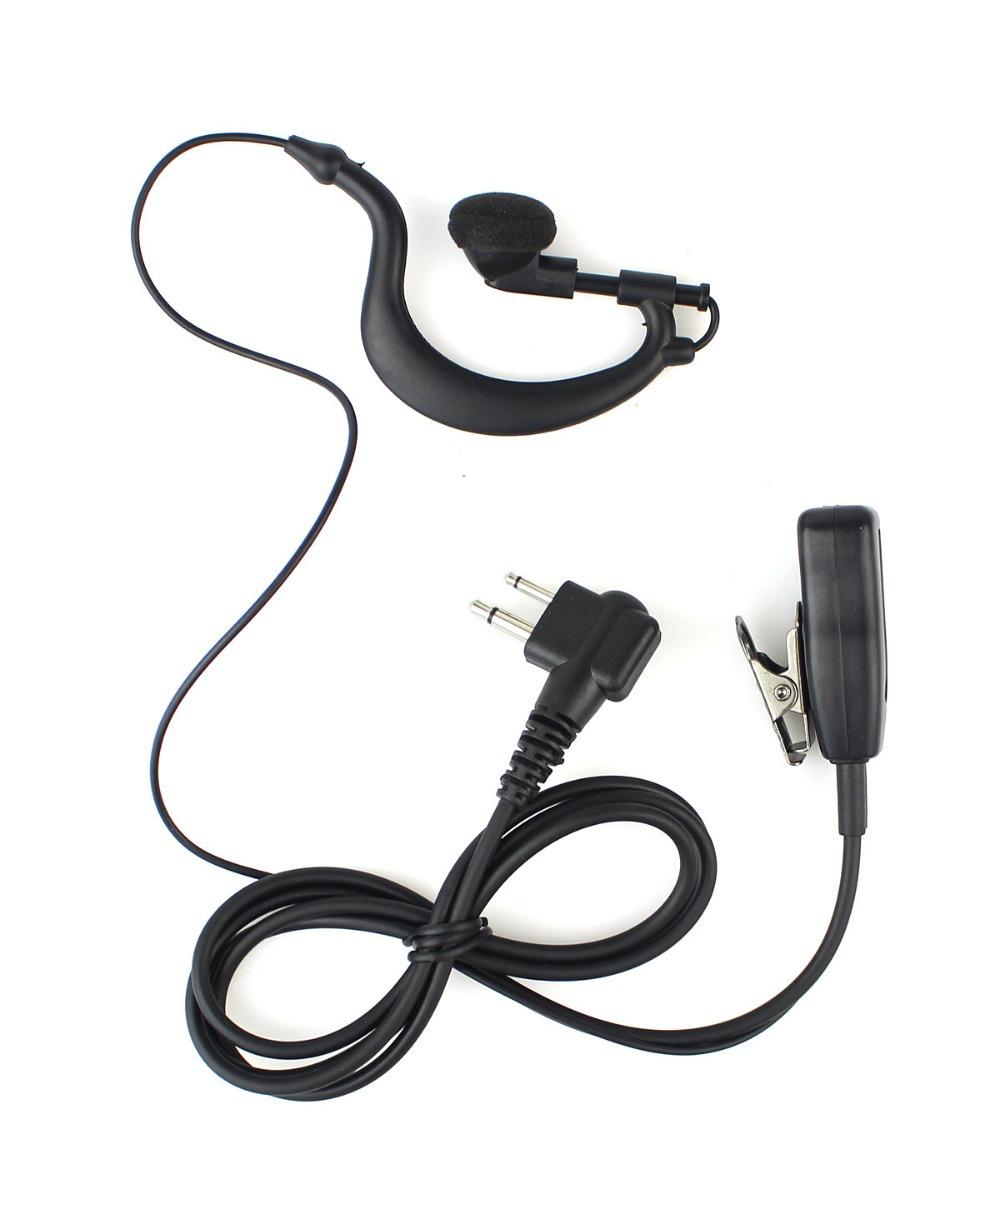 2 Pin PTT MIC Earpiece for Motorola Radio GP300 CP88 CP040 PRO1150 CLS1110 Black C0255A Eshow(China (Mainland))